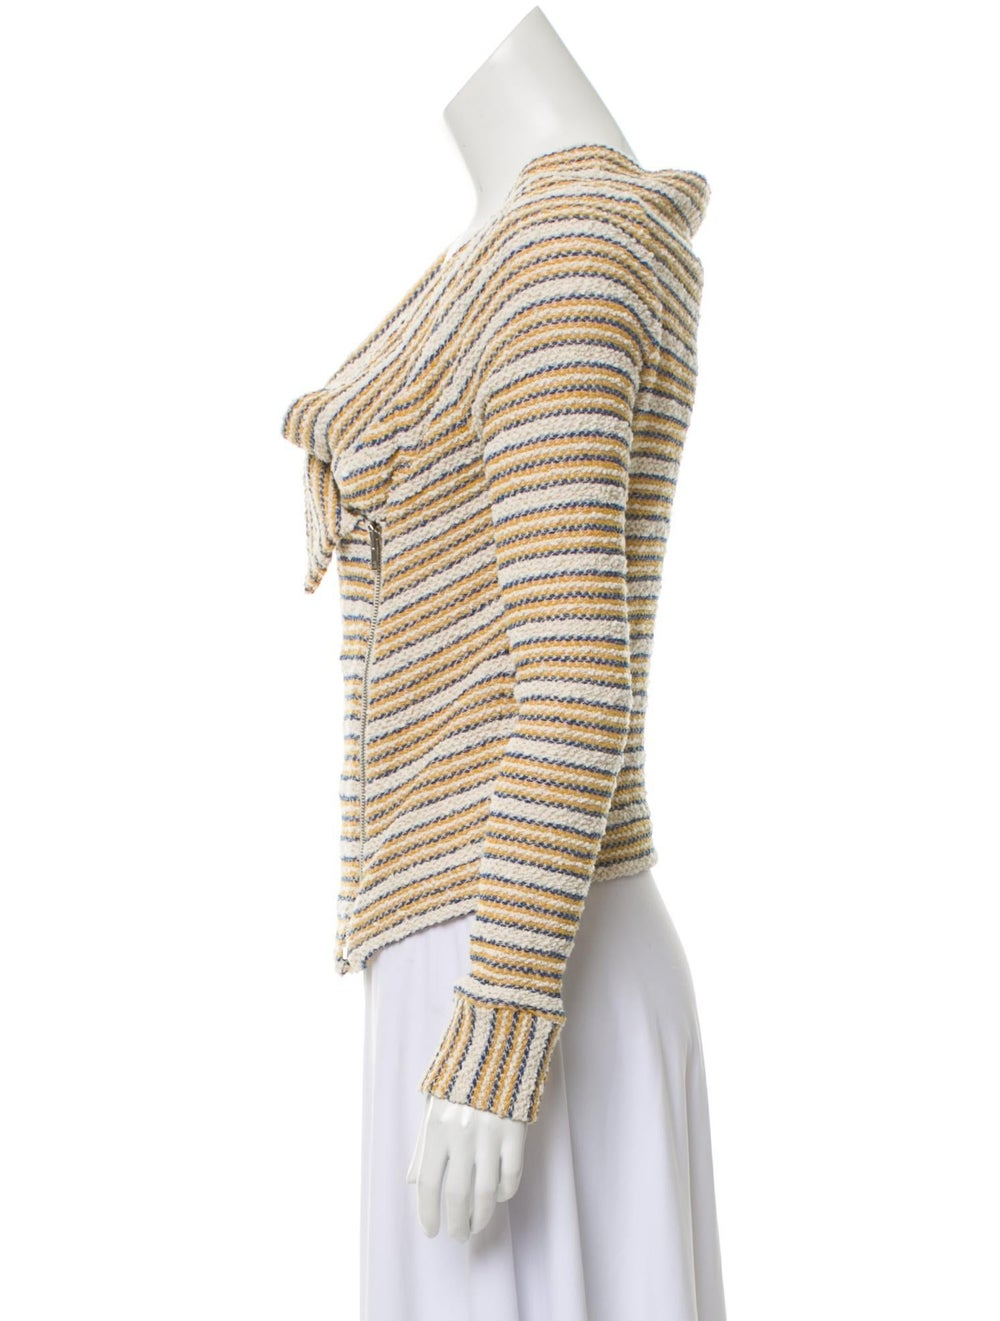 Iro Striped Tweed Jacket - image 2